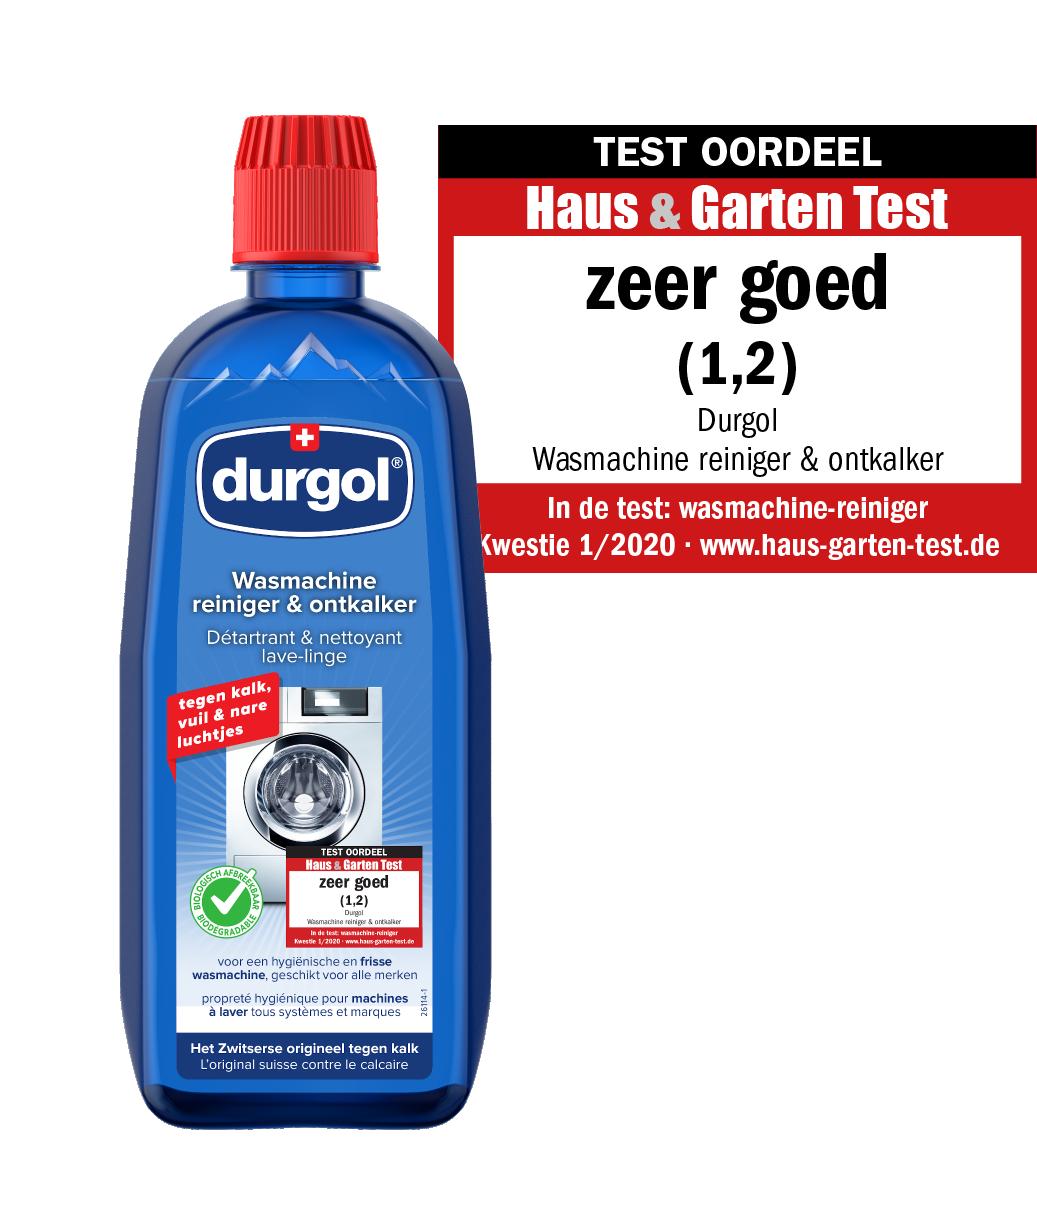 durgol wasmachine reiniger inclusief keurmerk